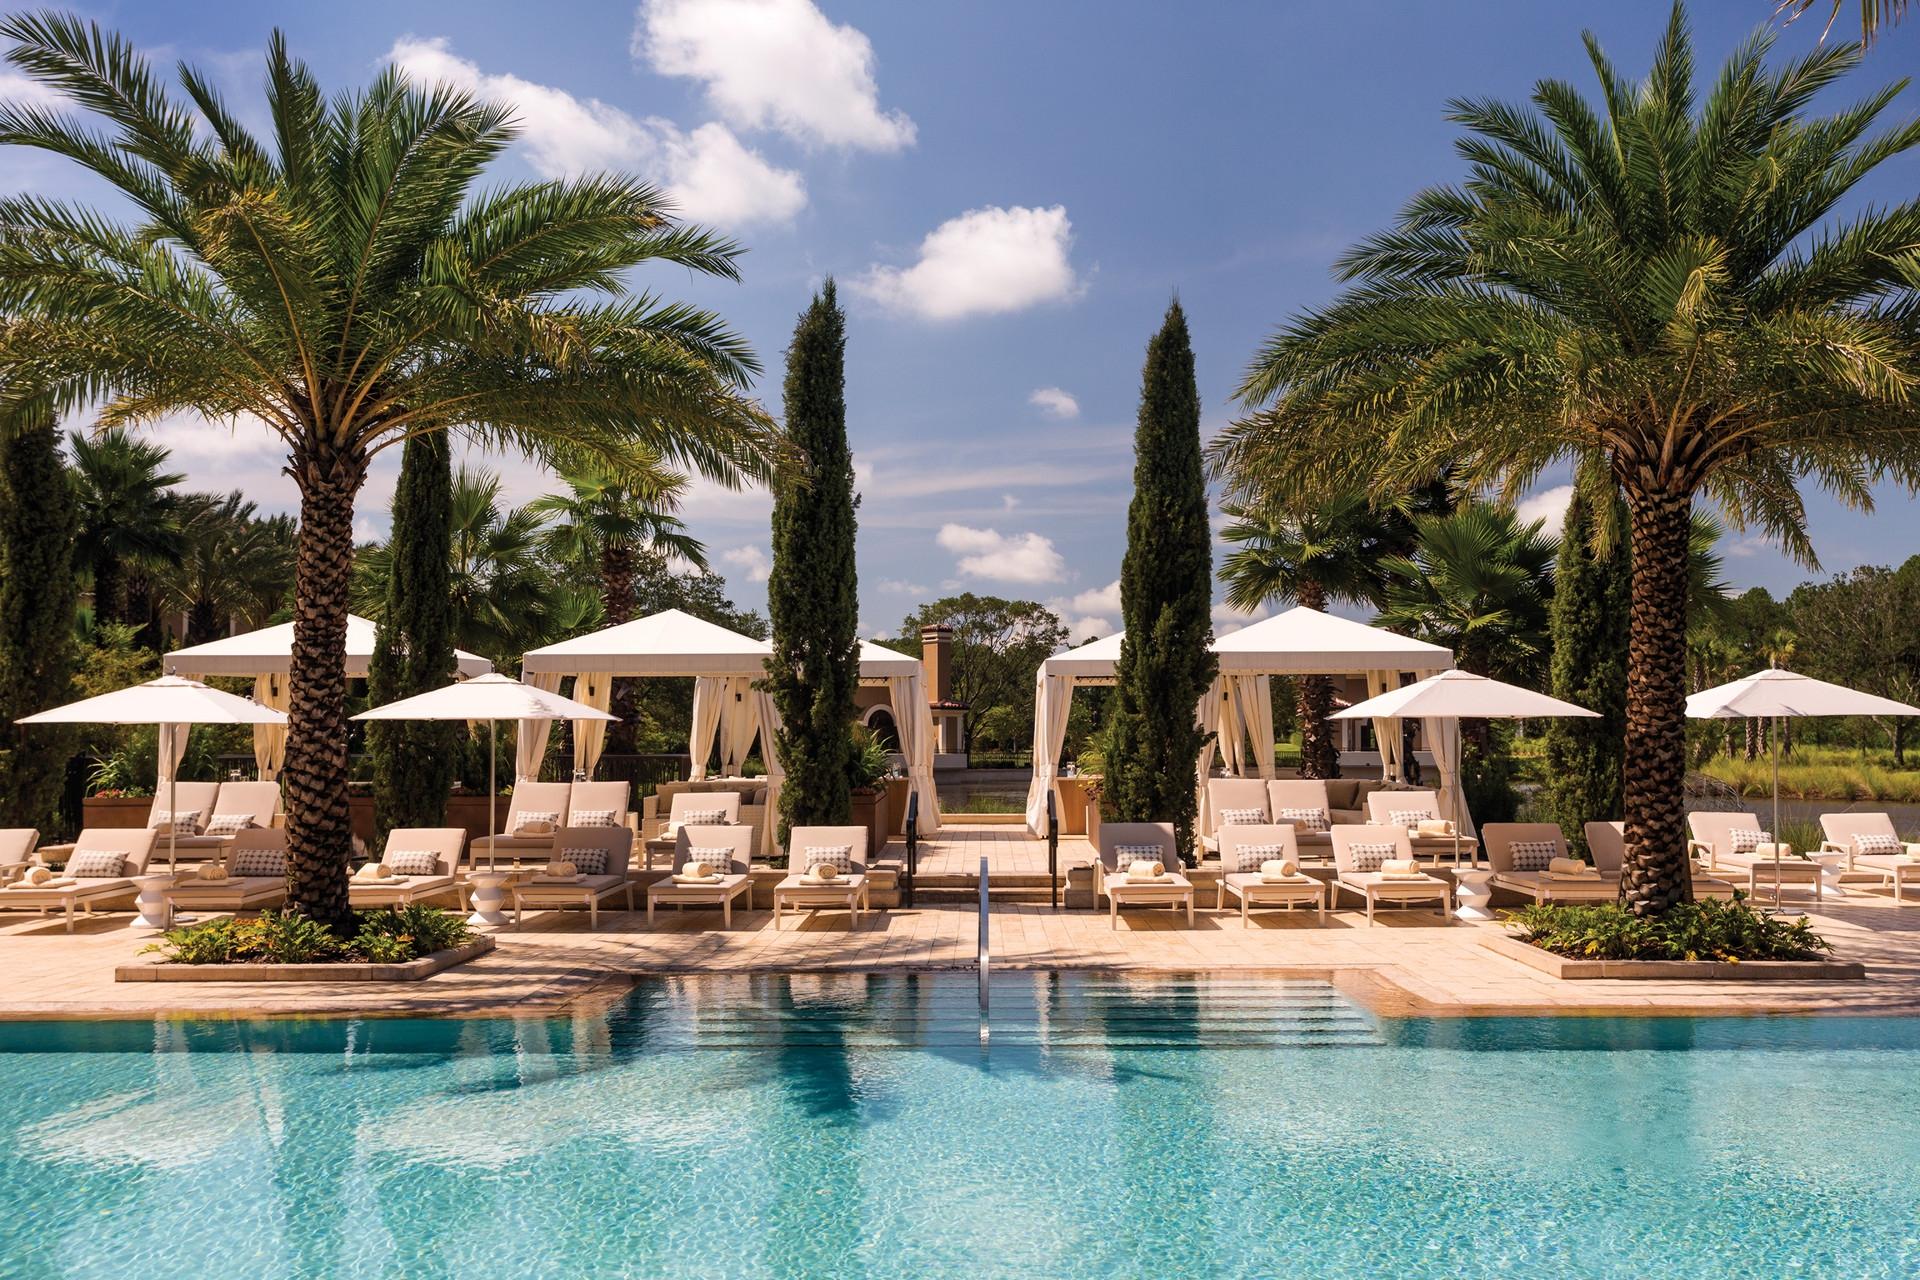 Four Seasons Orlando Pool